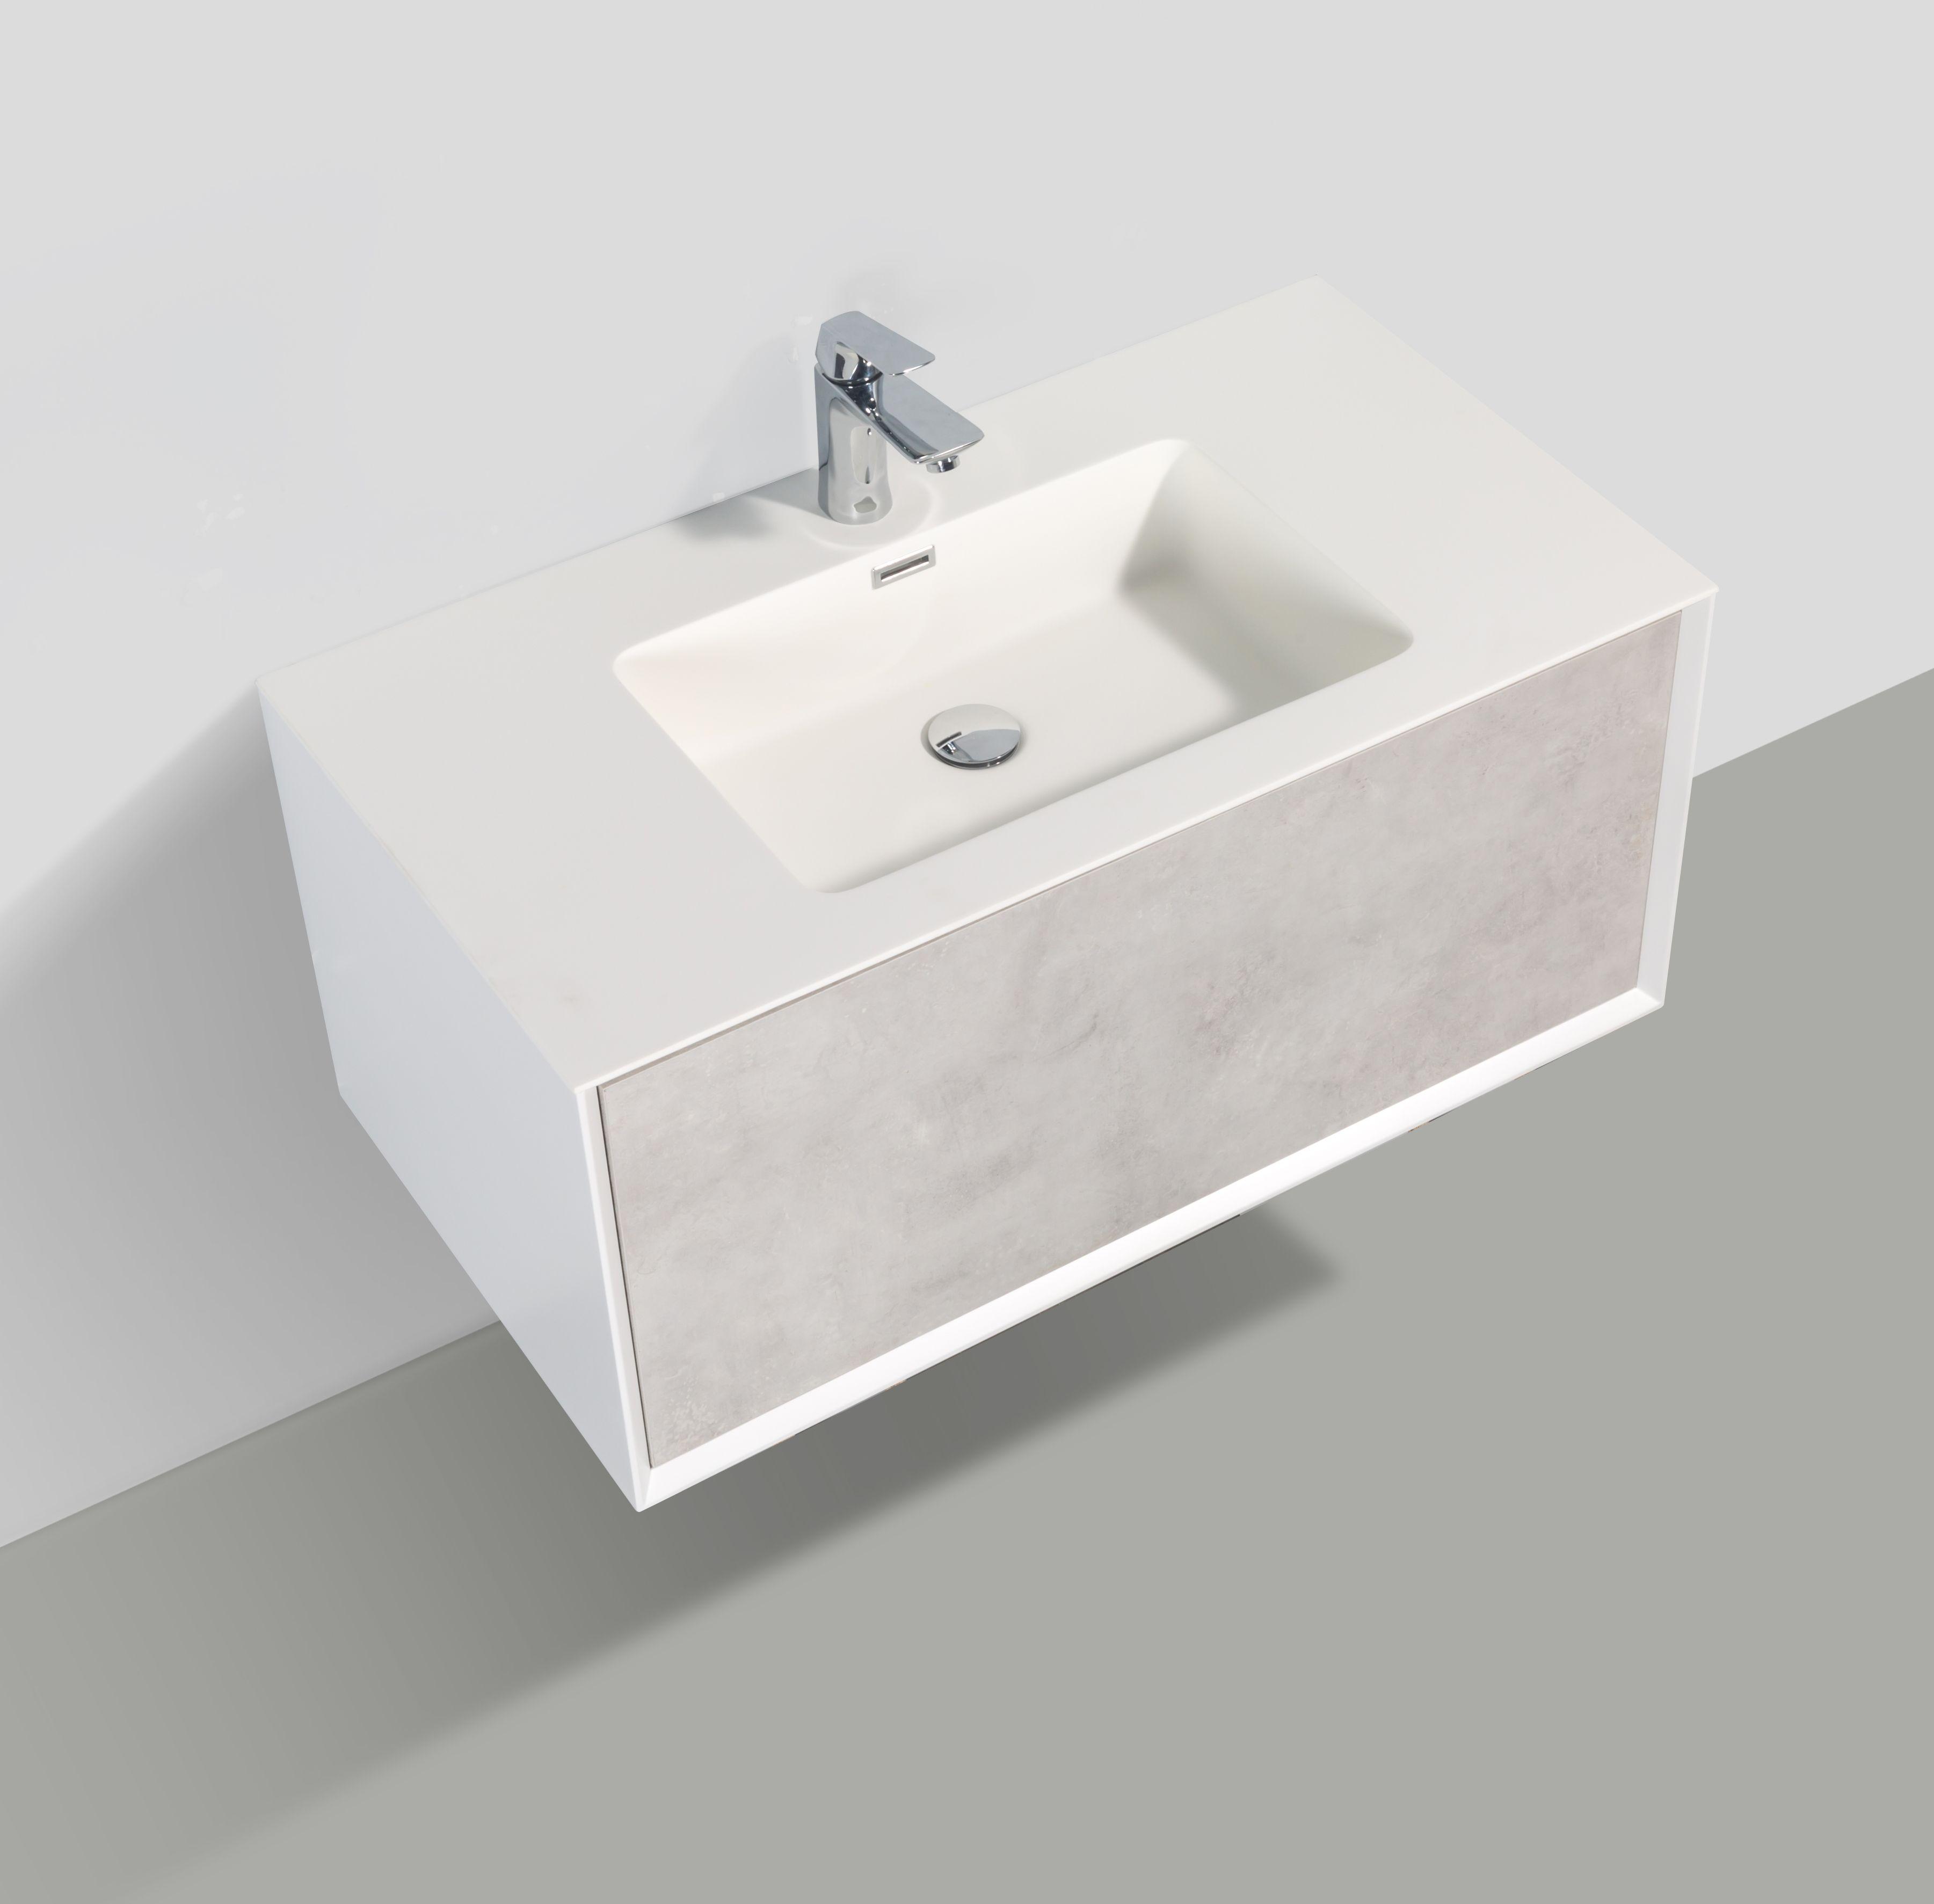 Badmöbel Unterschrank inkl. Waschtisch SELVA 60 (beton)